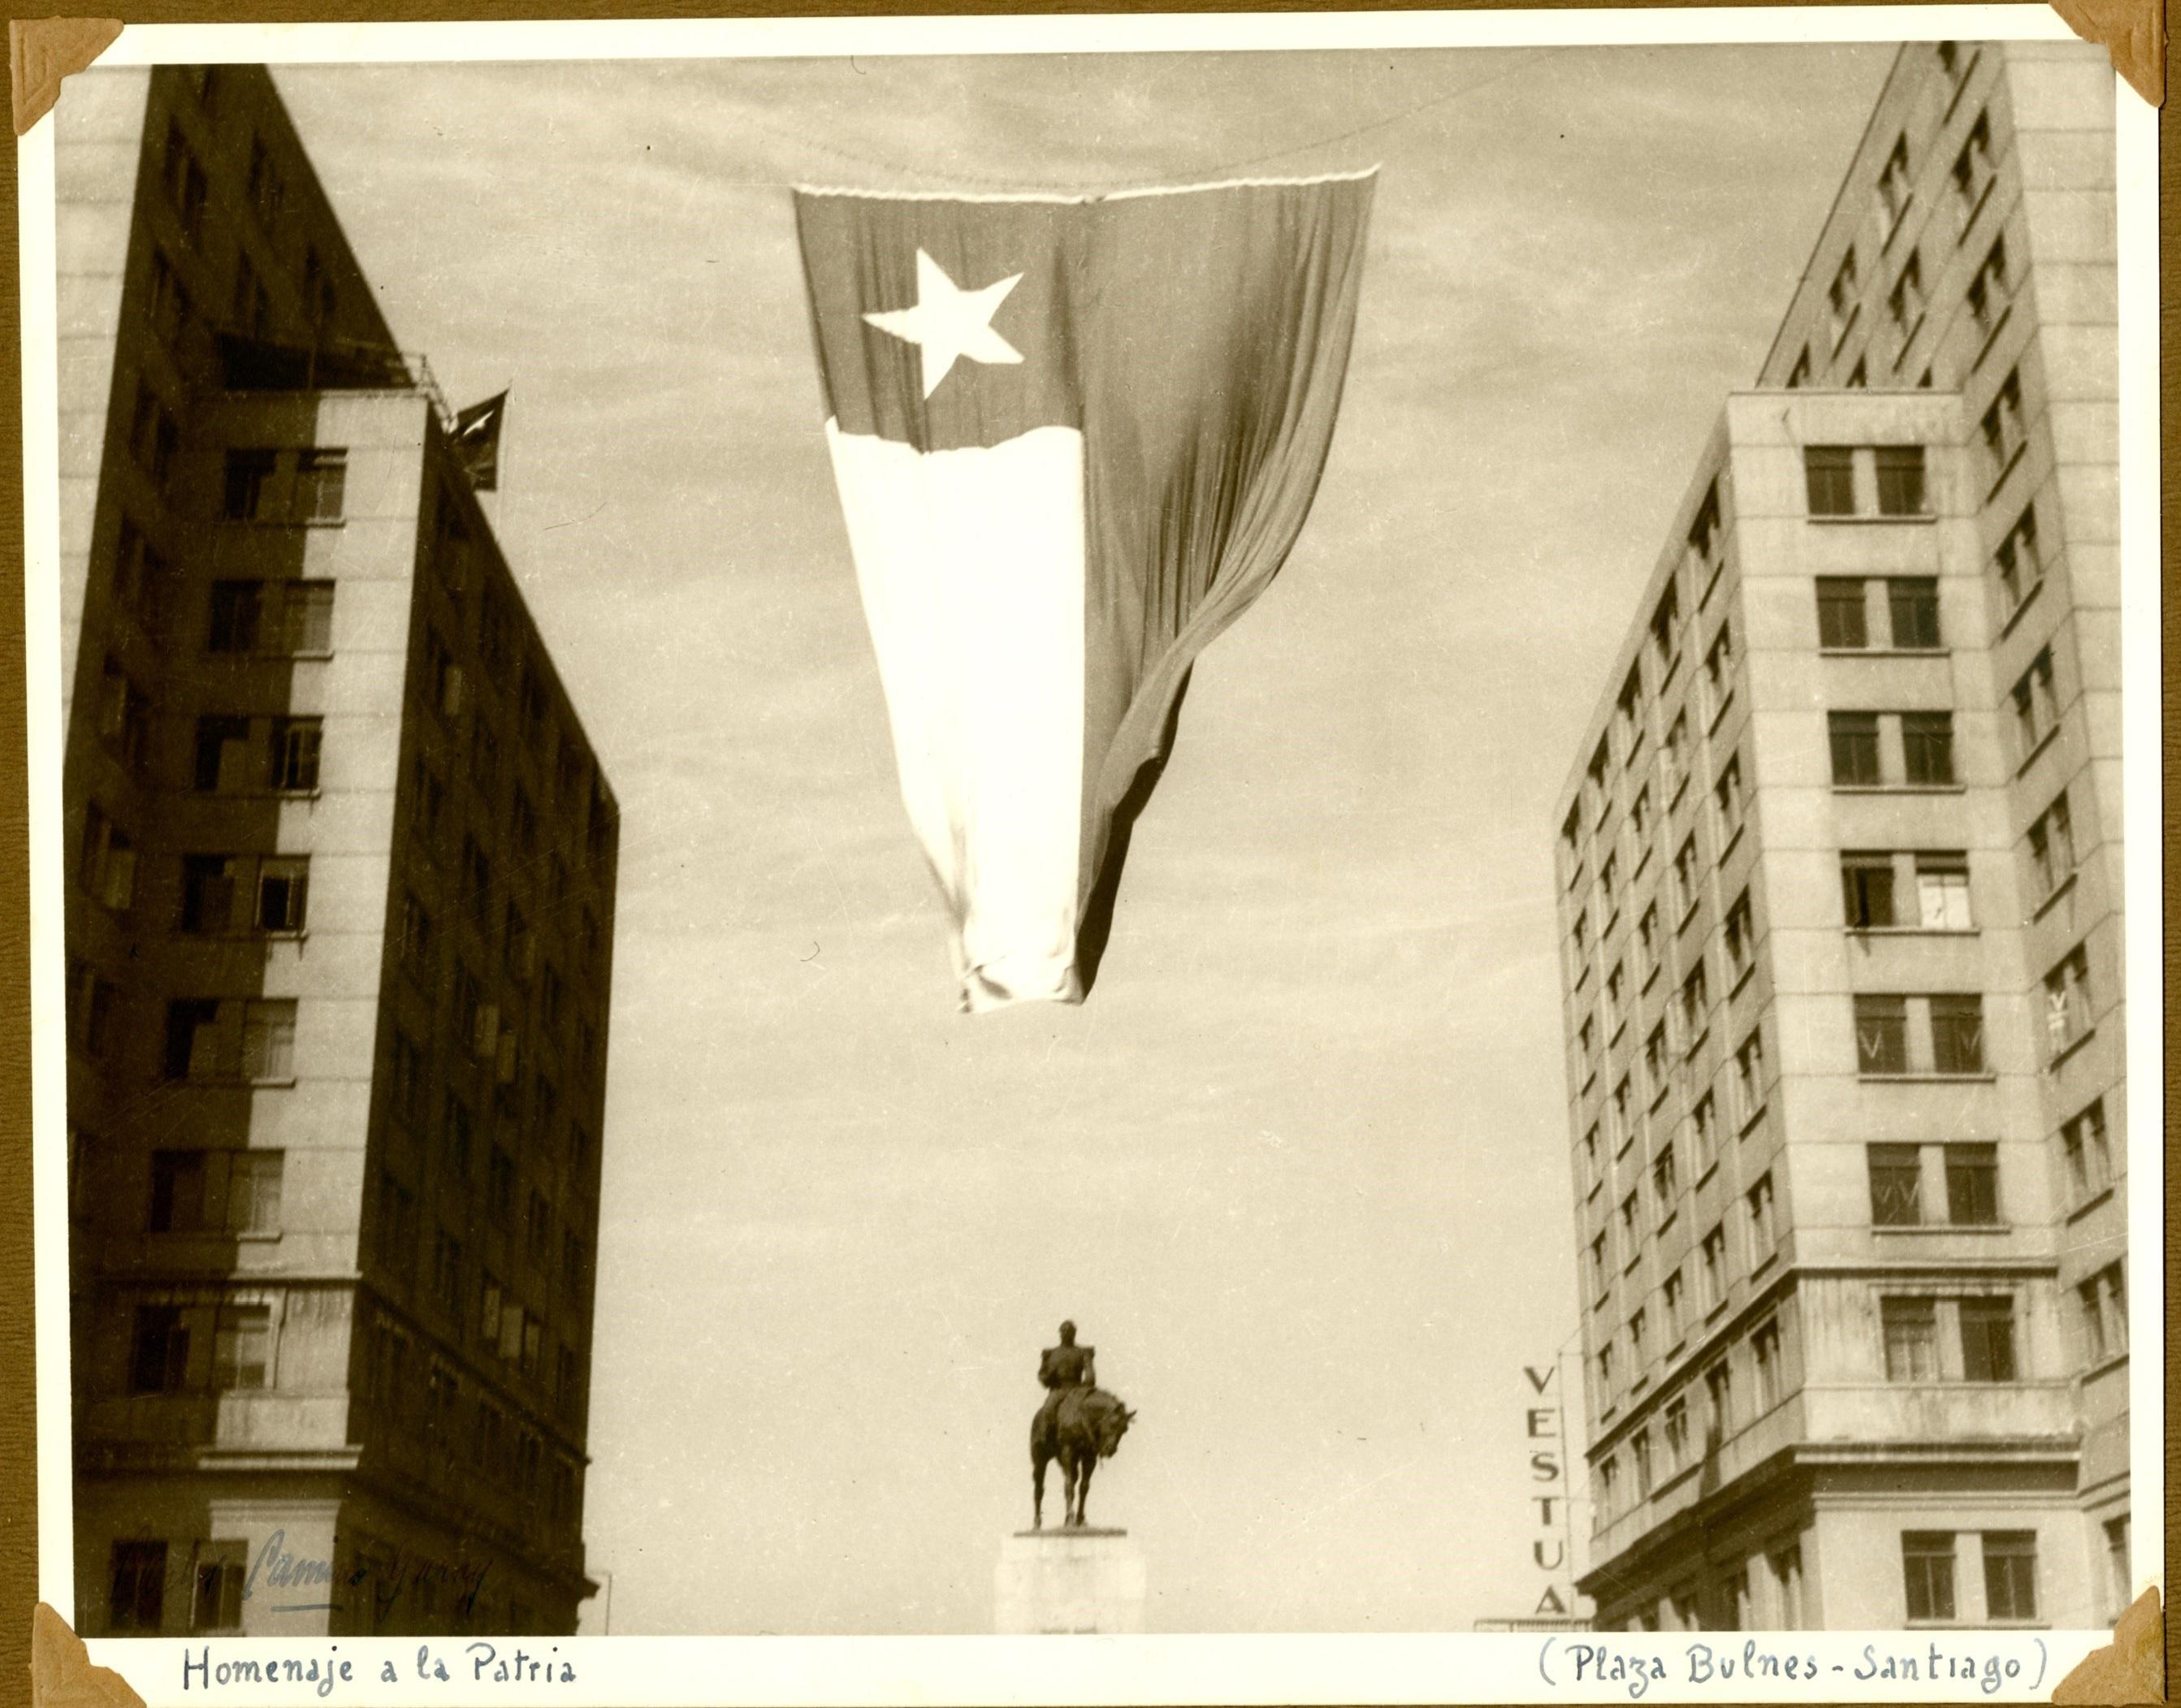 Enterreno - Fotos históricas de chile - fotos antiguas de Chile - Plaza Bulnes